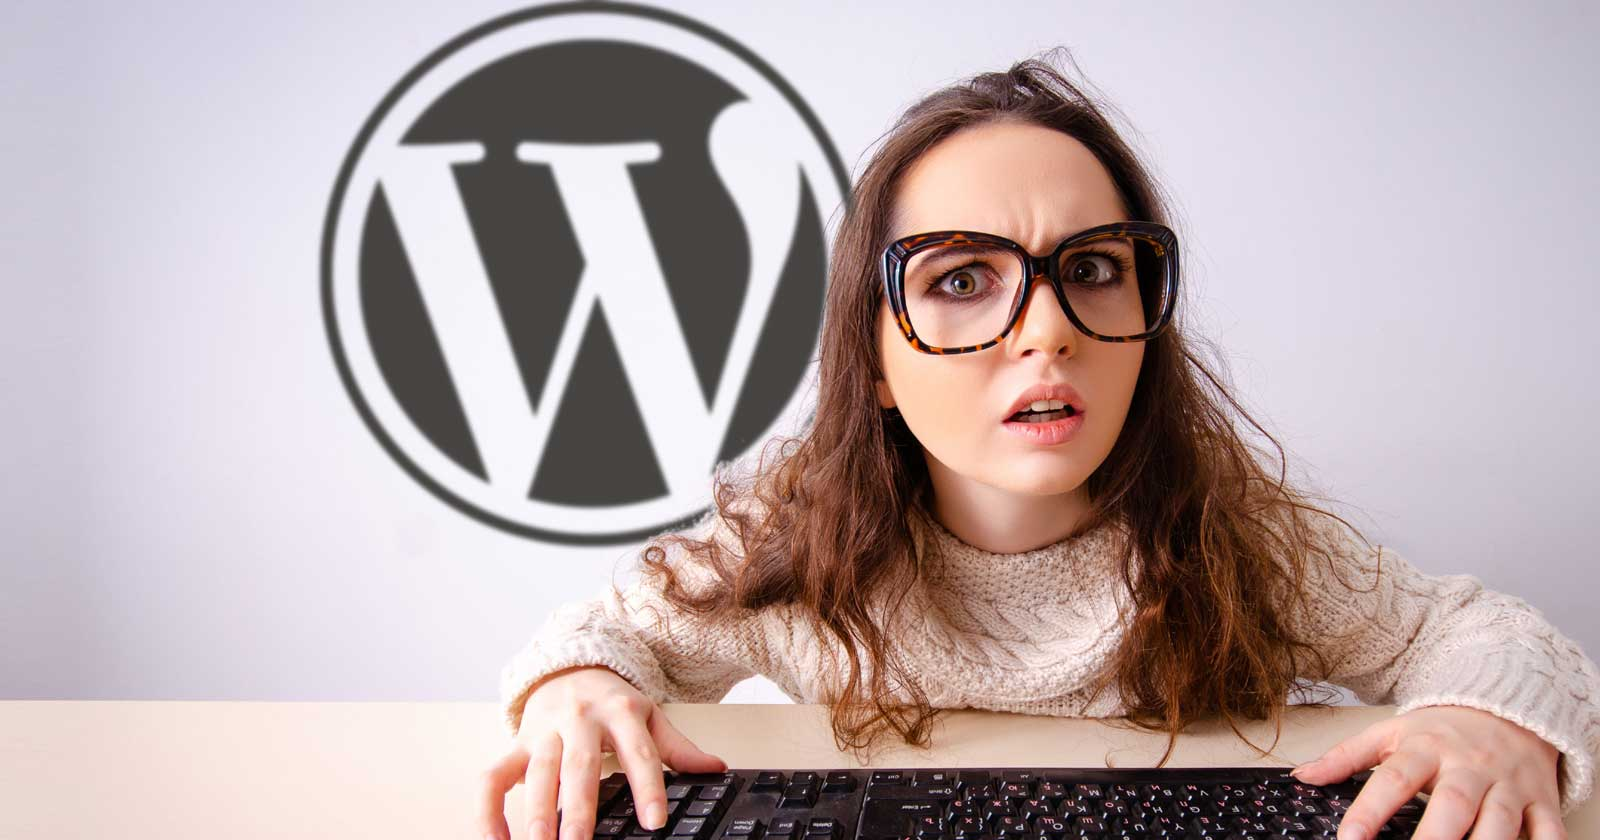 WordPress.com Now Offers Website Development WordPress.com announced Built by WordPress.com, a website development - Search Engine Journal